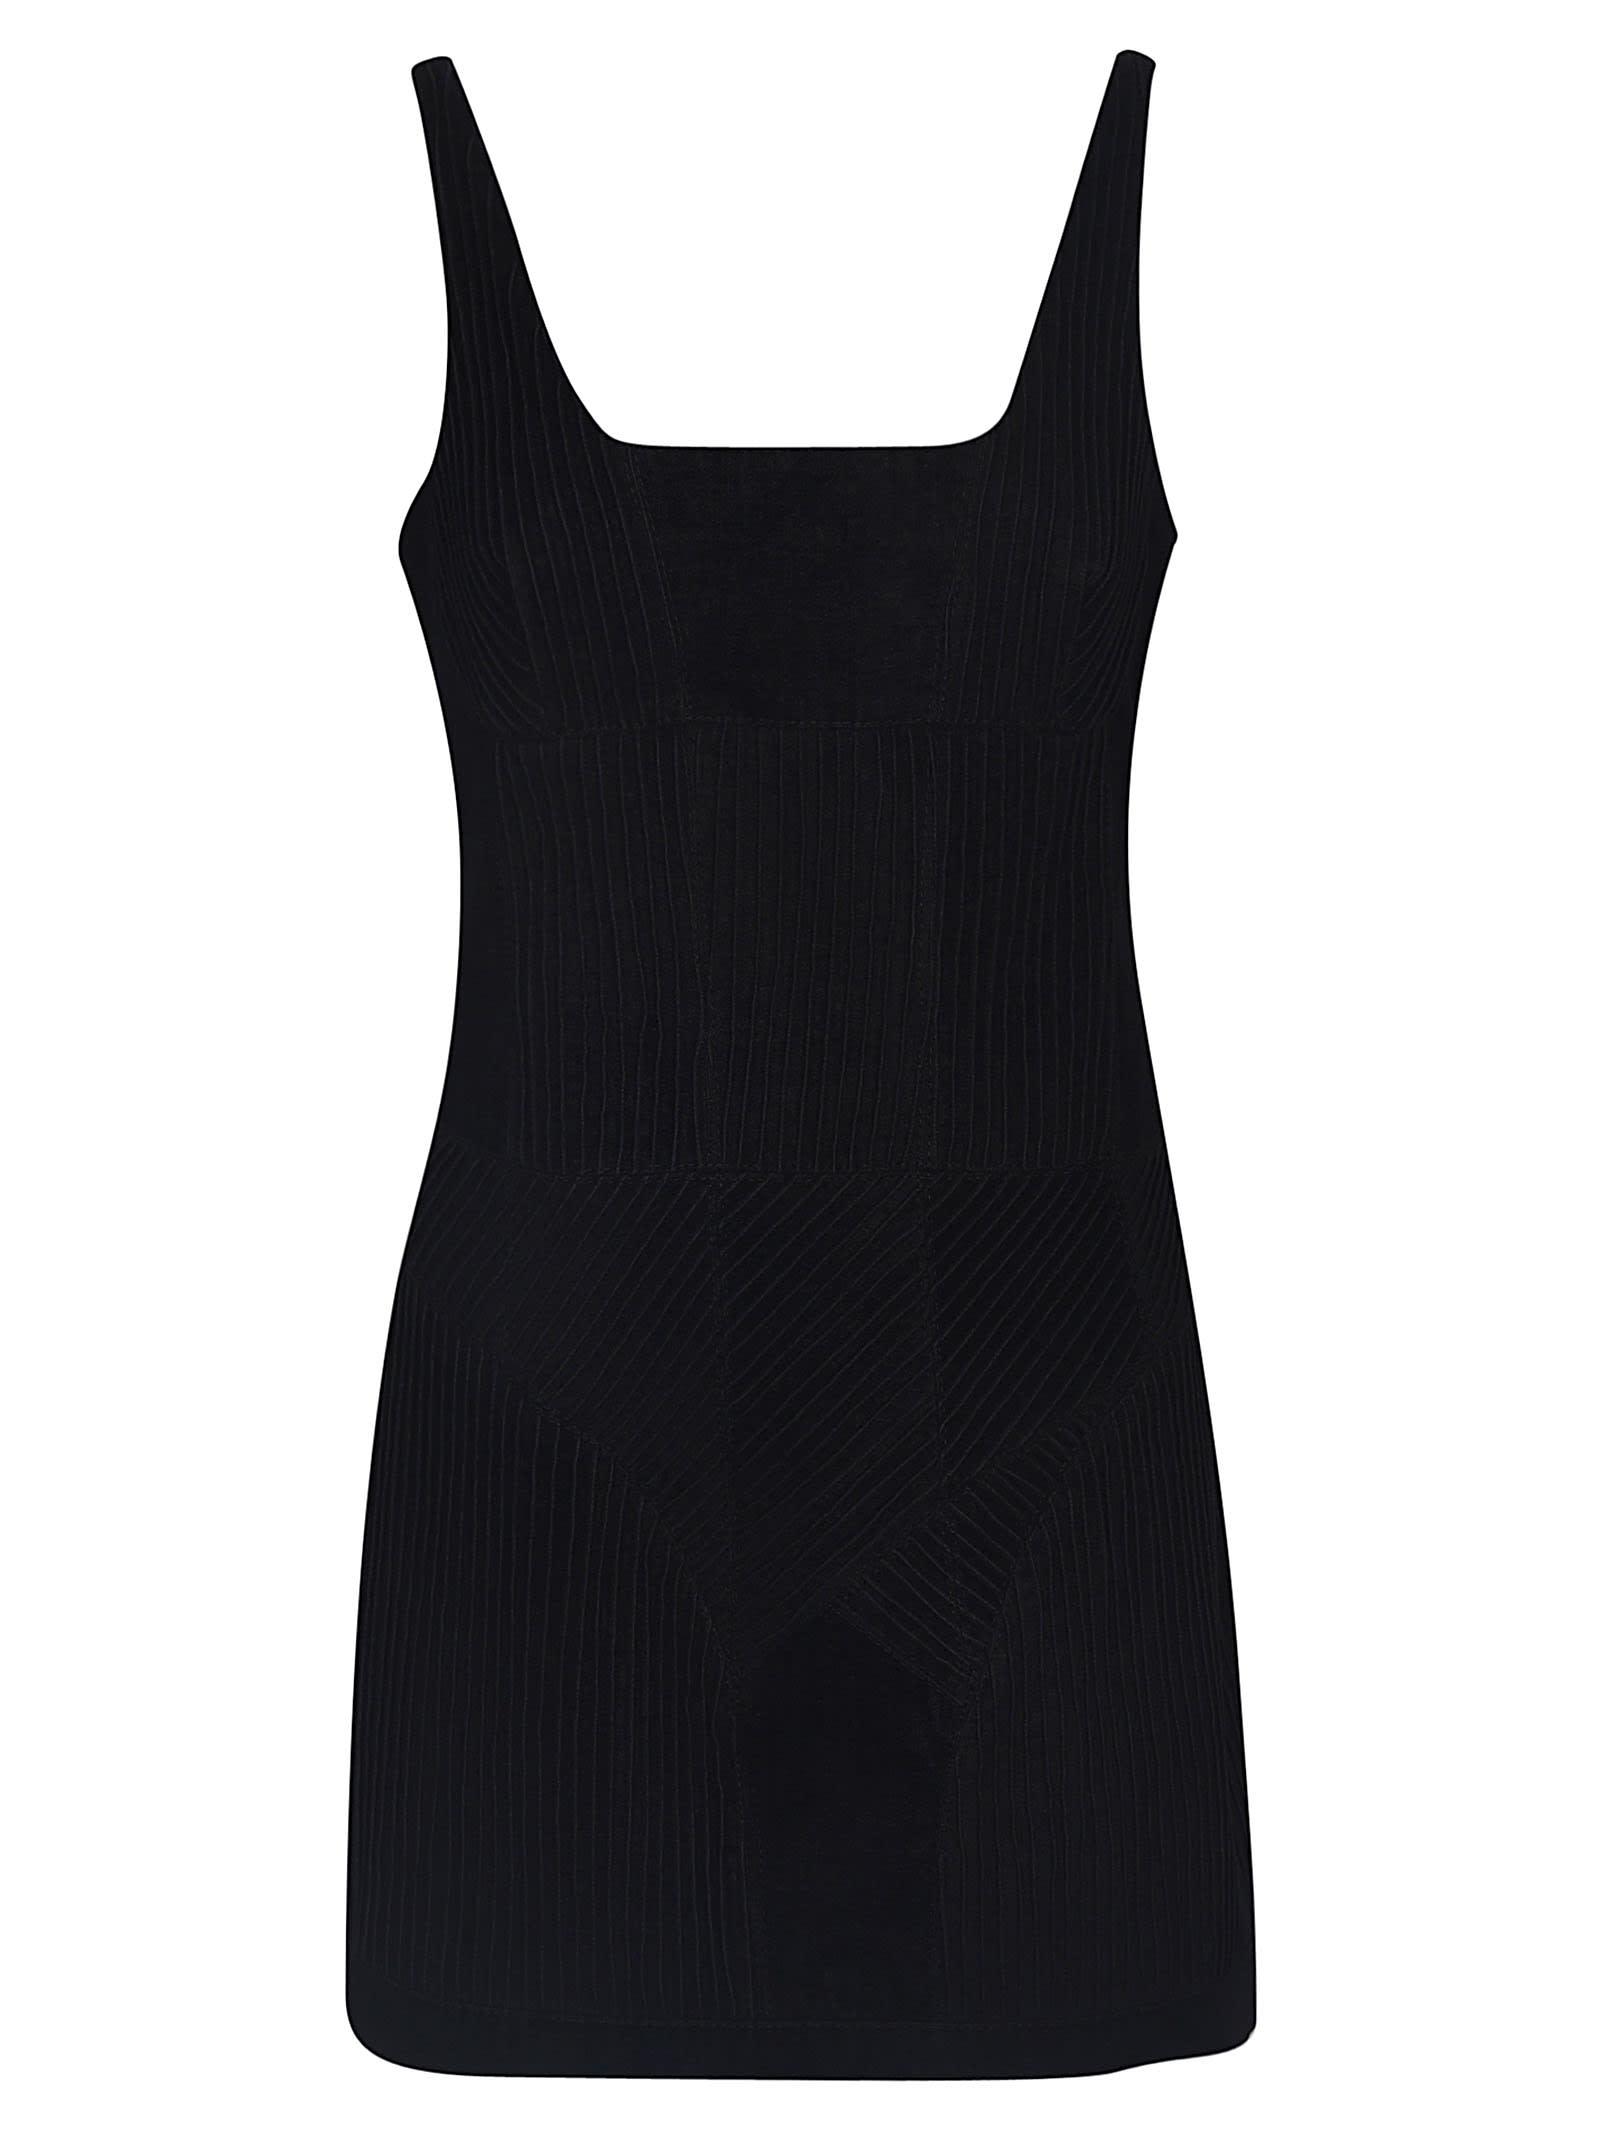 Giovanni Bedin Classic Short Sleeveless Dress